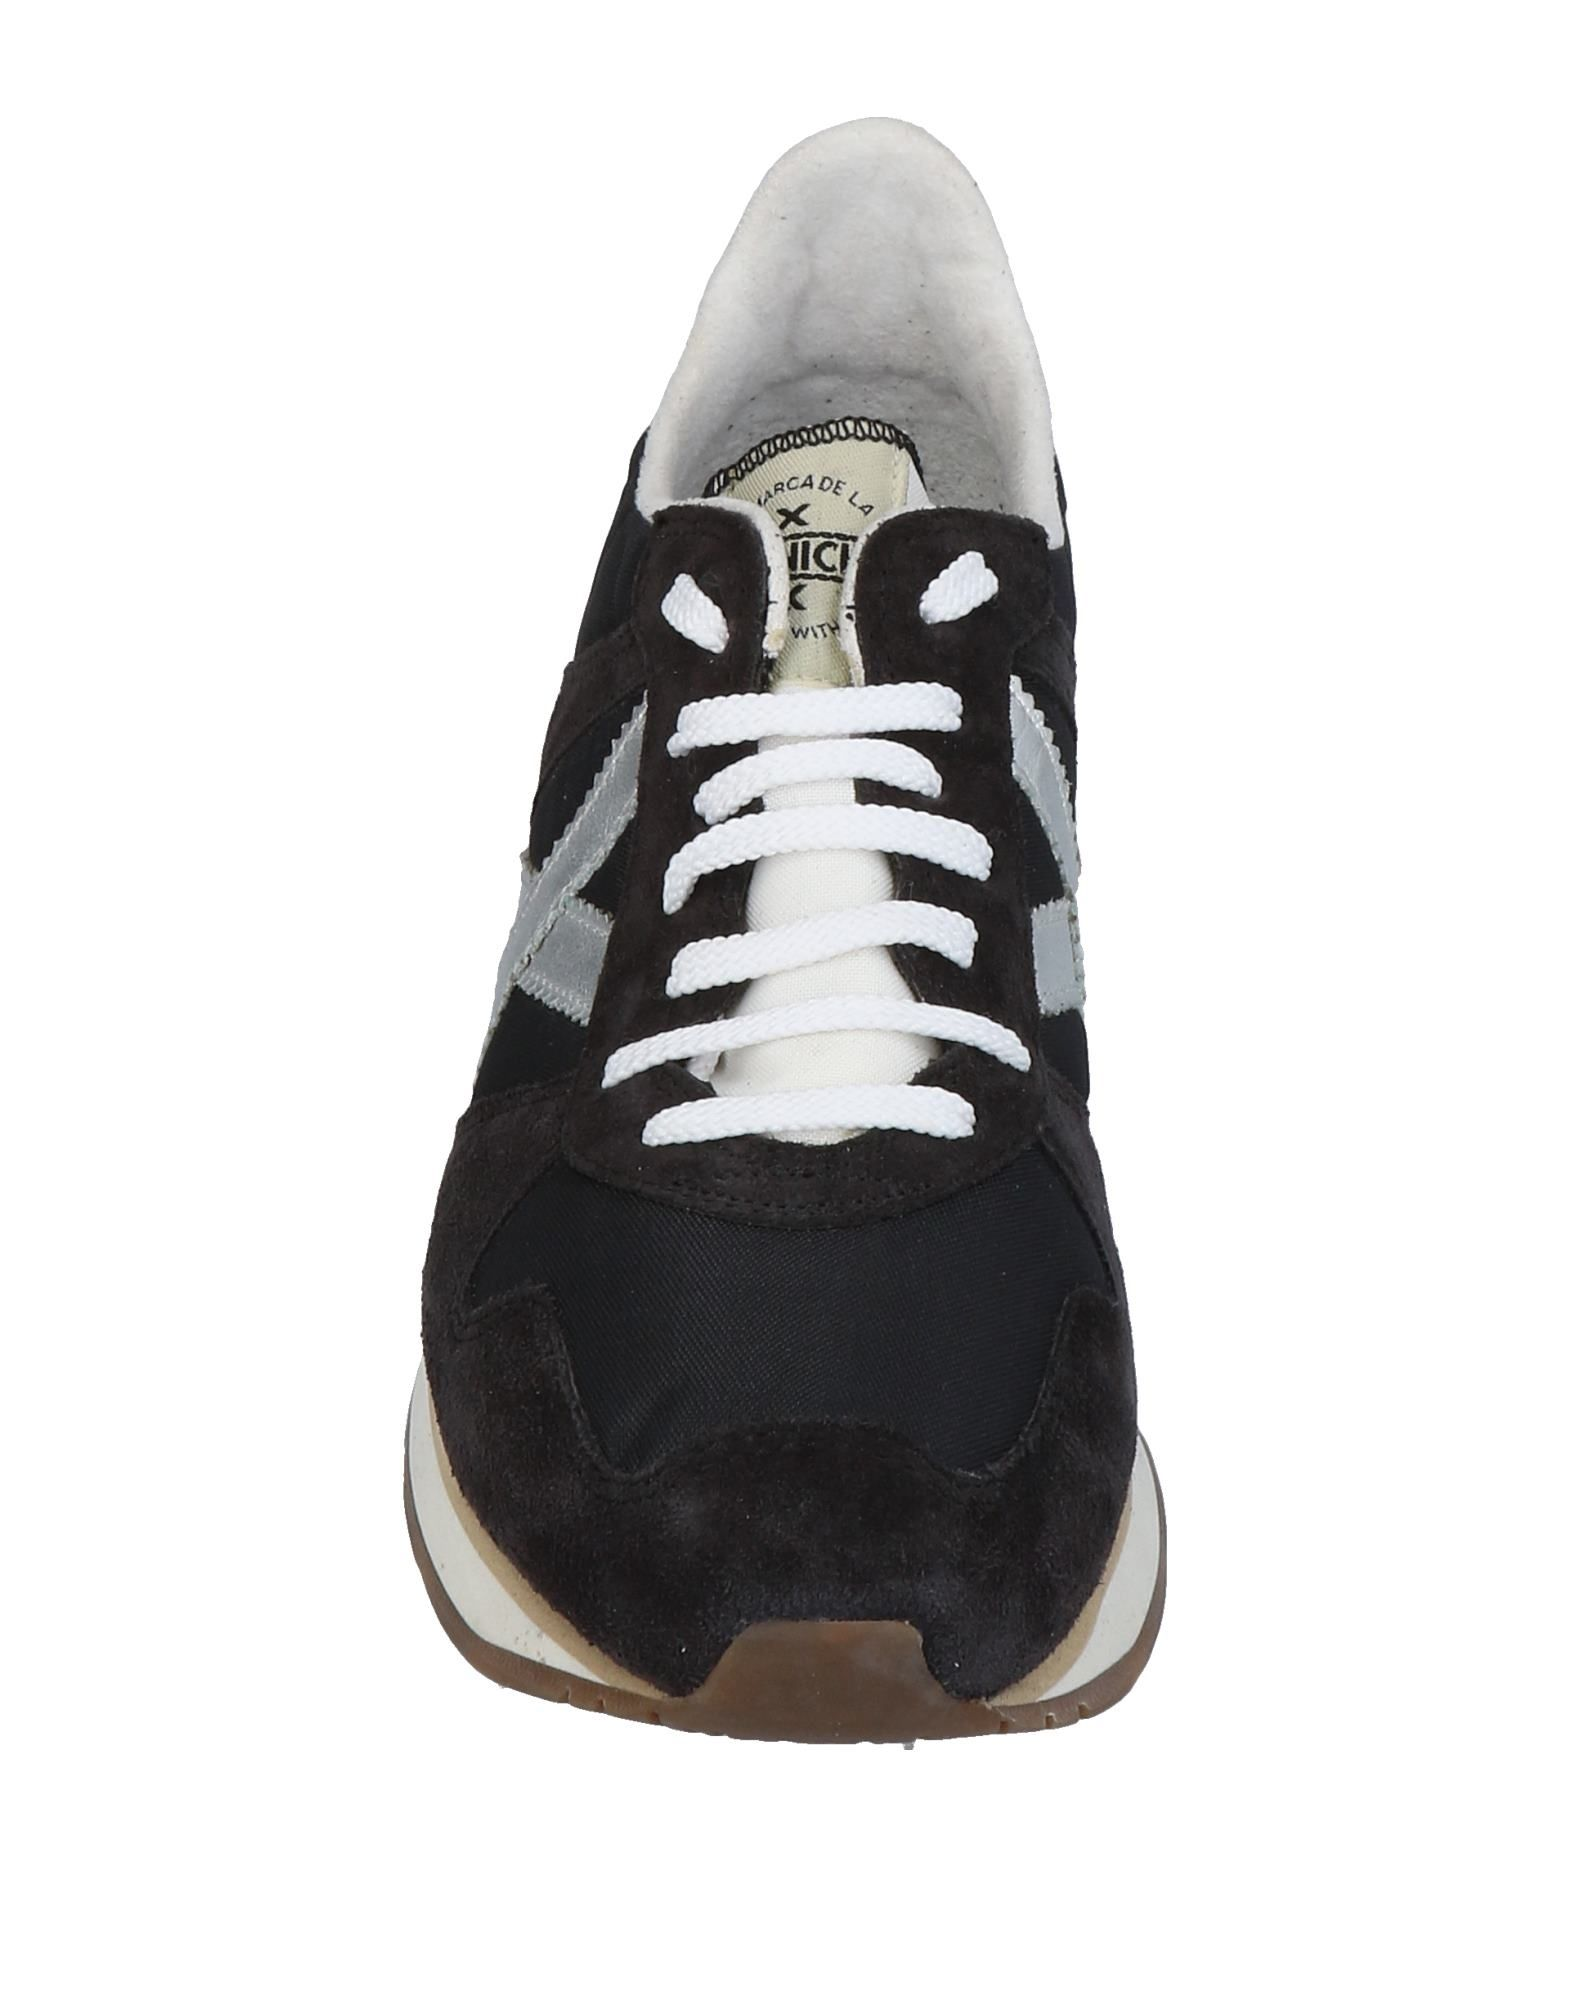 Rabatt Herren echte Schuhe Munich Sneakers Herren Rabatt  11454734KI 186639